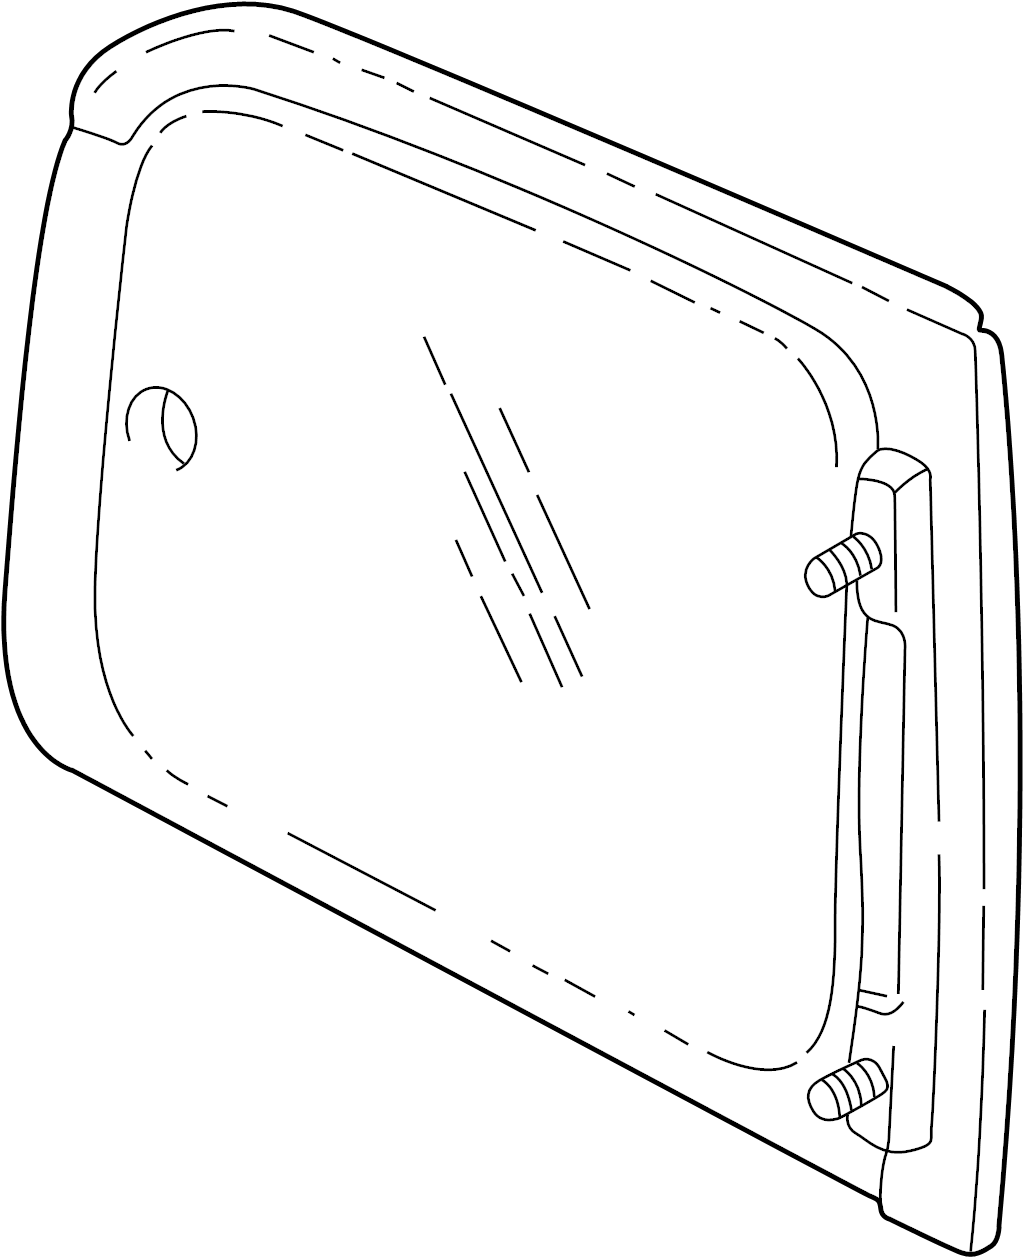 2005 pontiac montana sv6 parts diagrams